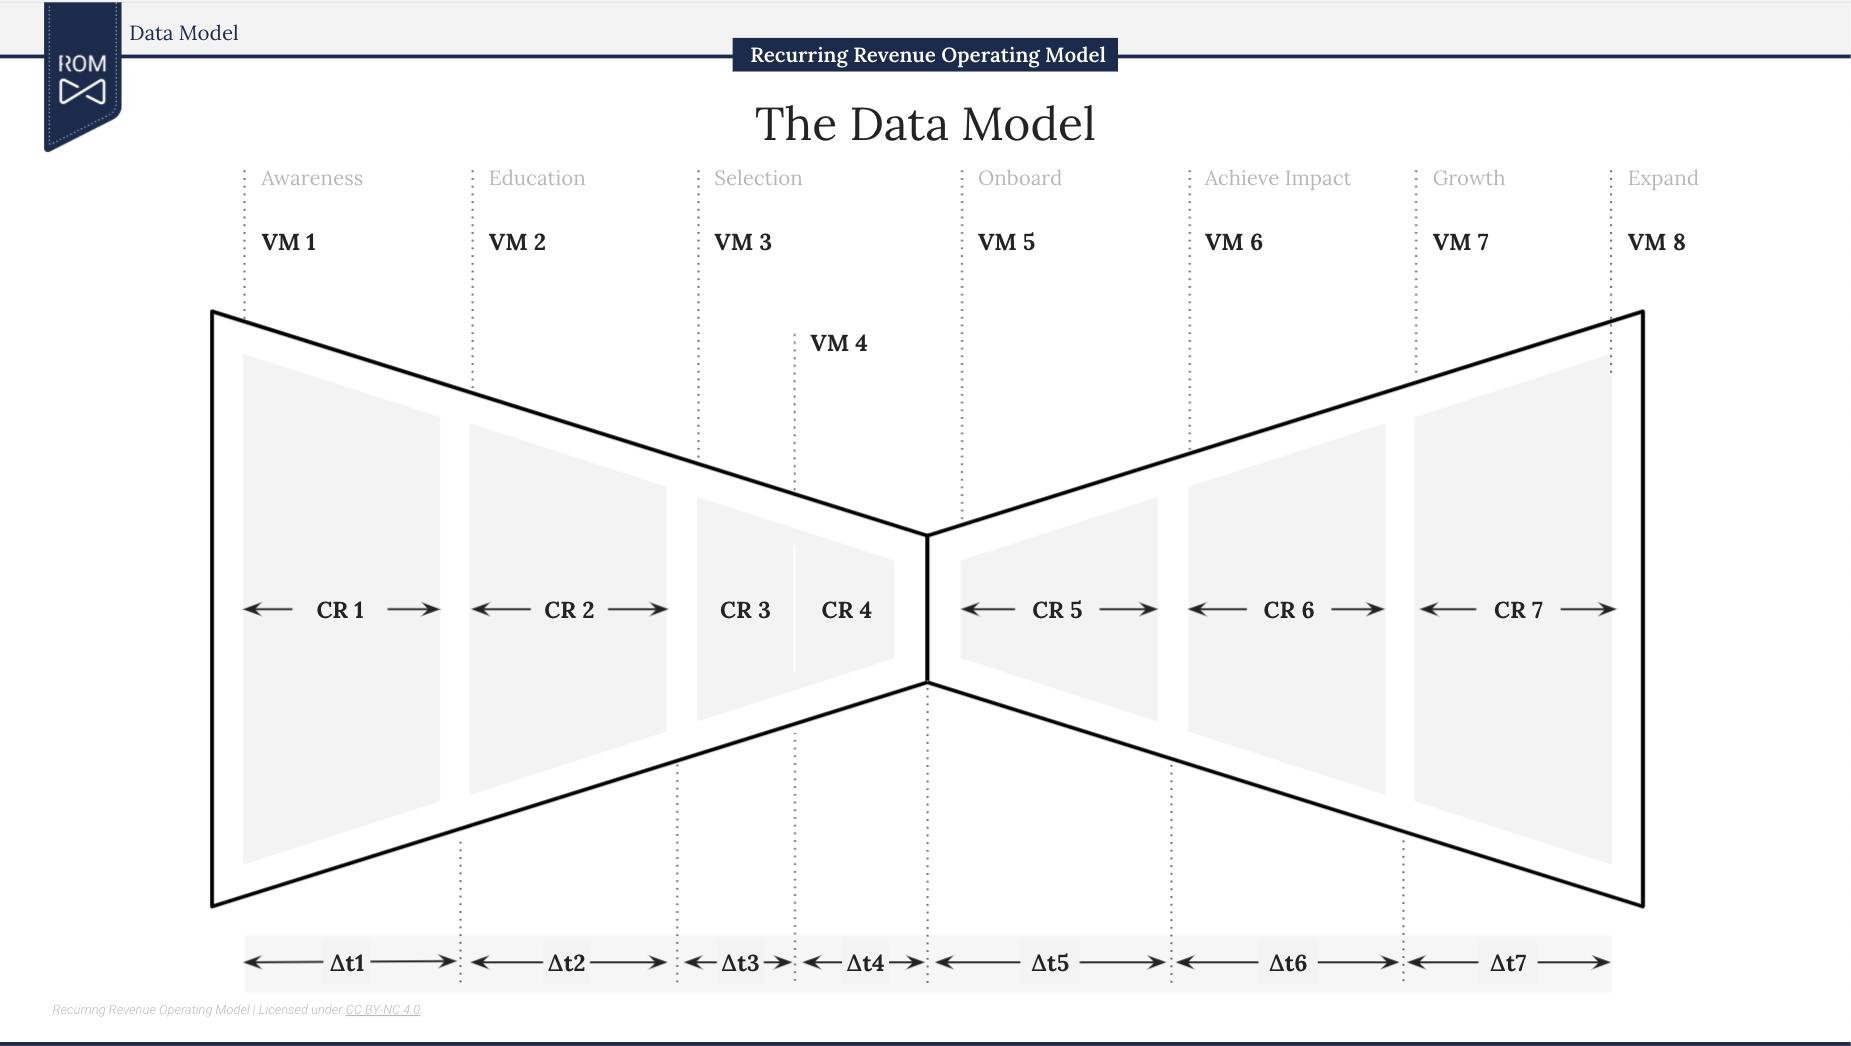 The Data Model for recurring revenue businesses.